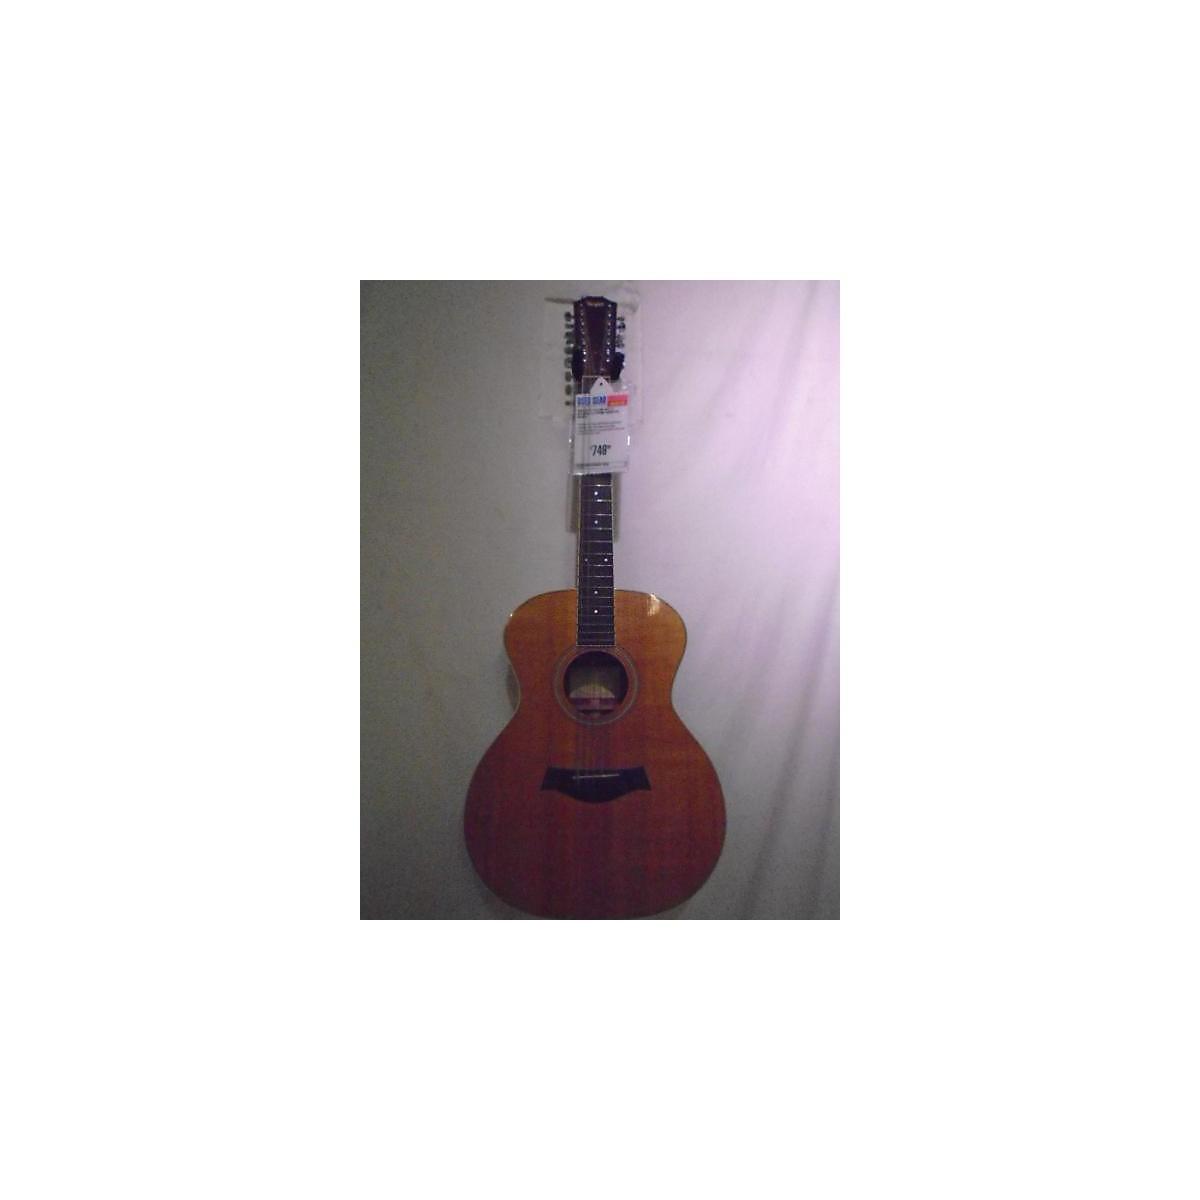 Taylor 2012 GA3-12 12 String Acoustic Guitar